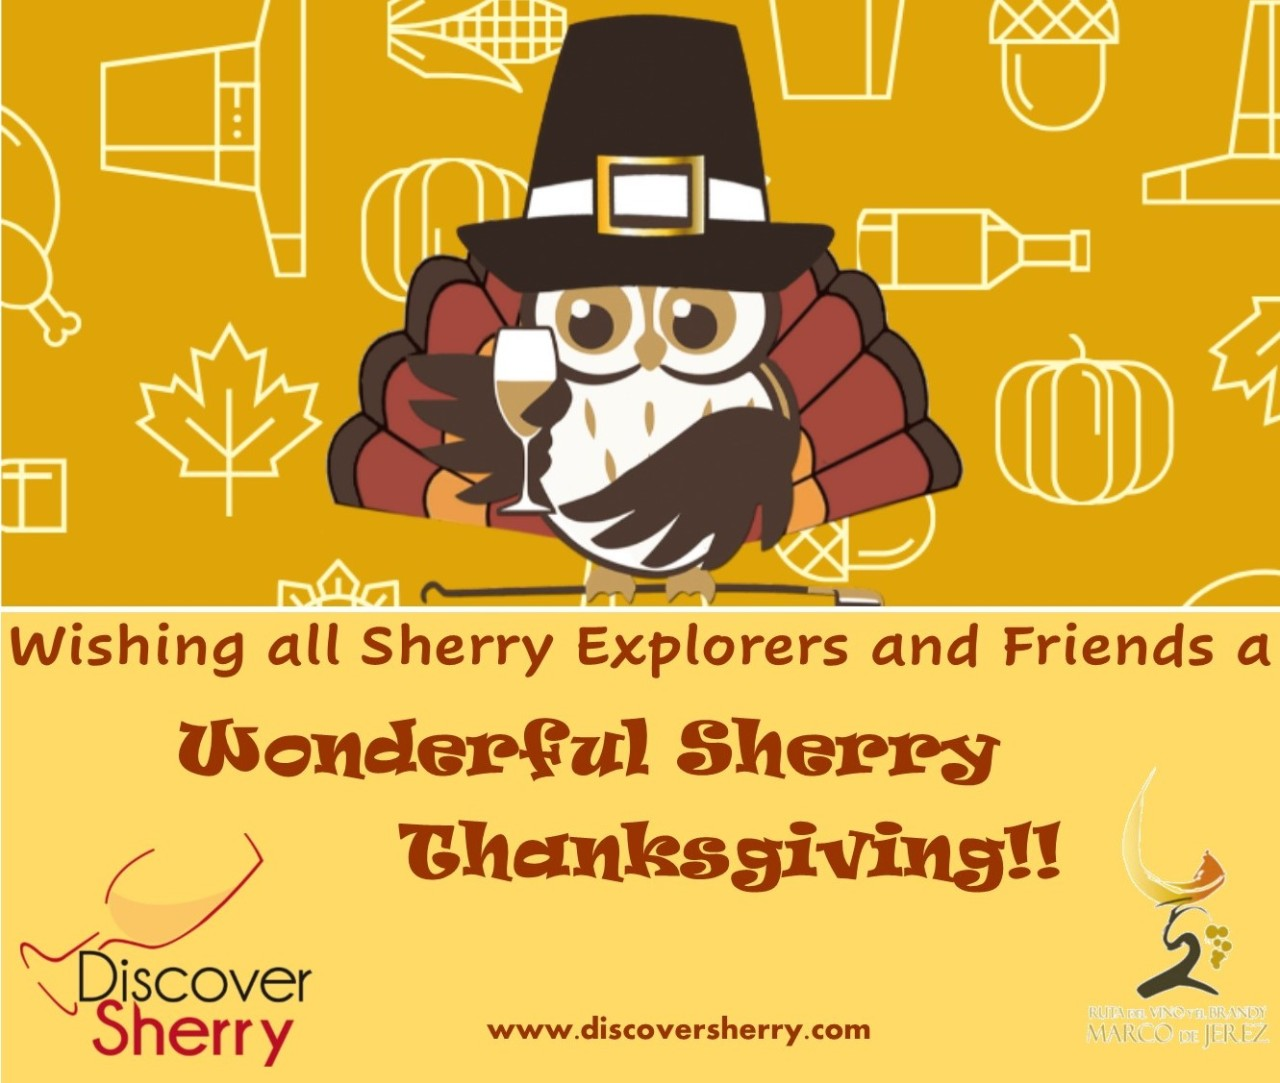 Happy Sherry Thanksgiving!!